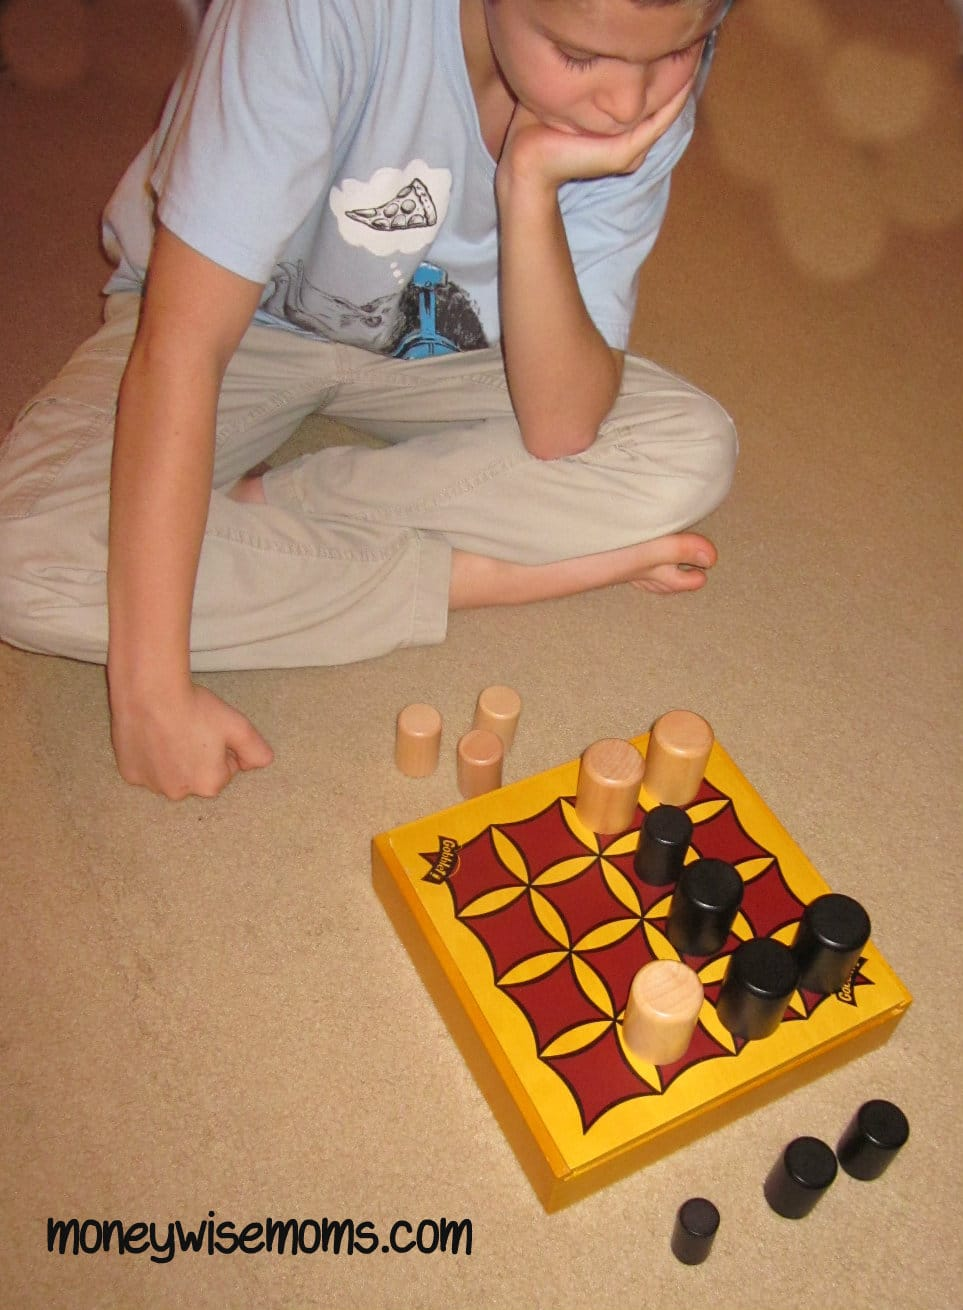 Gobblet | Game Night with Blue Orange Games | MoneywiseMoms